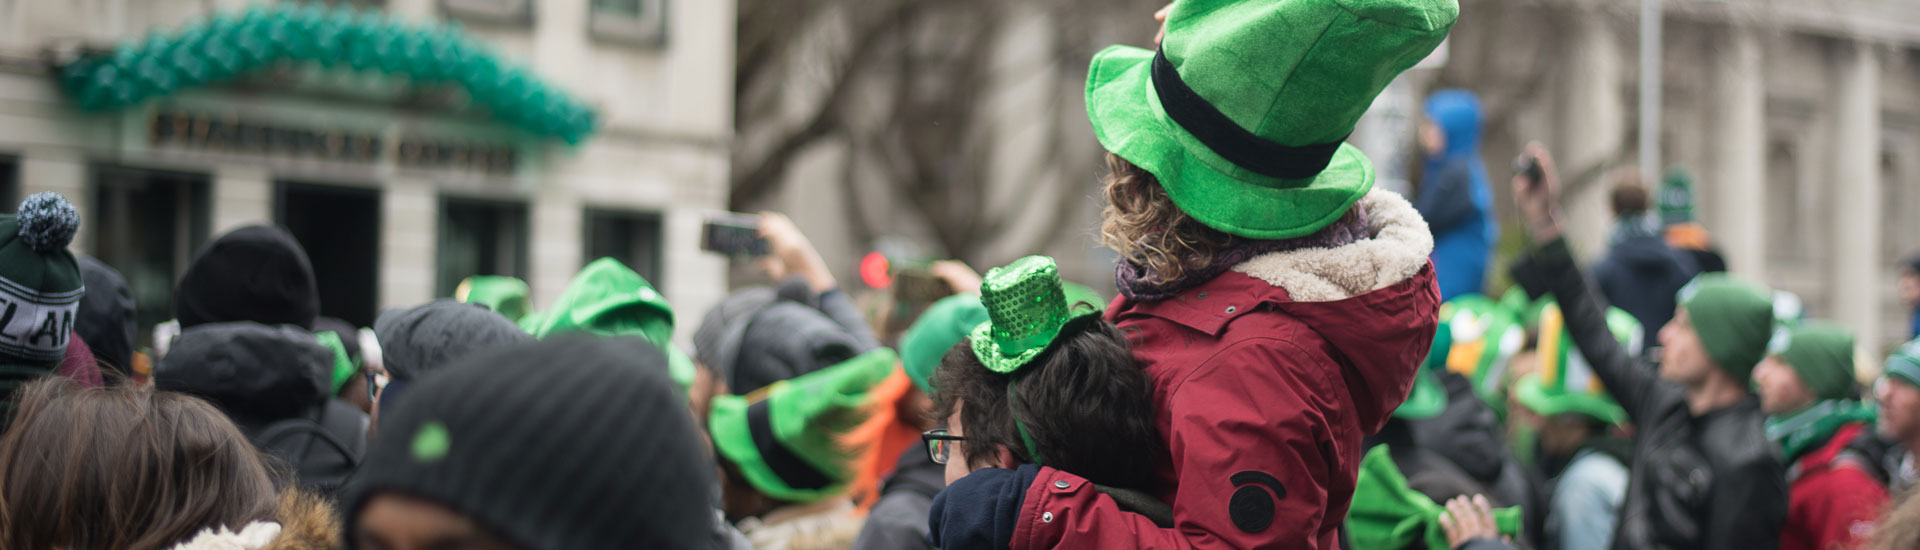 St.-Patricks-Day-Dublin